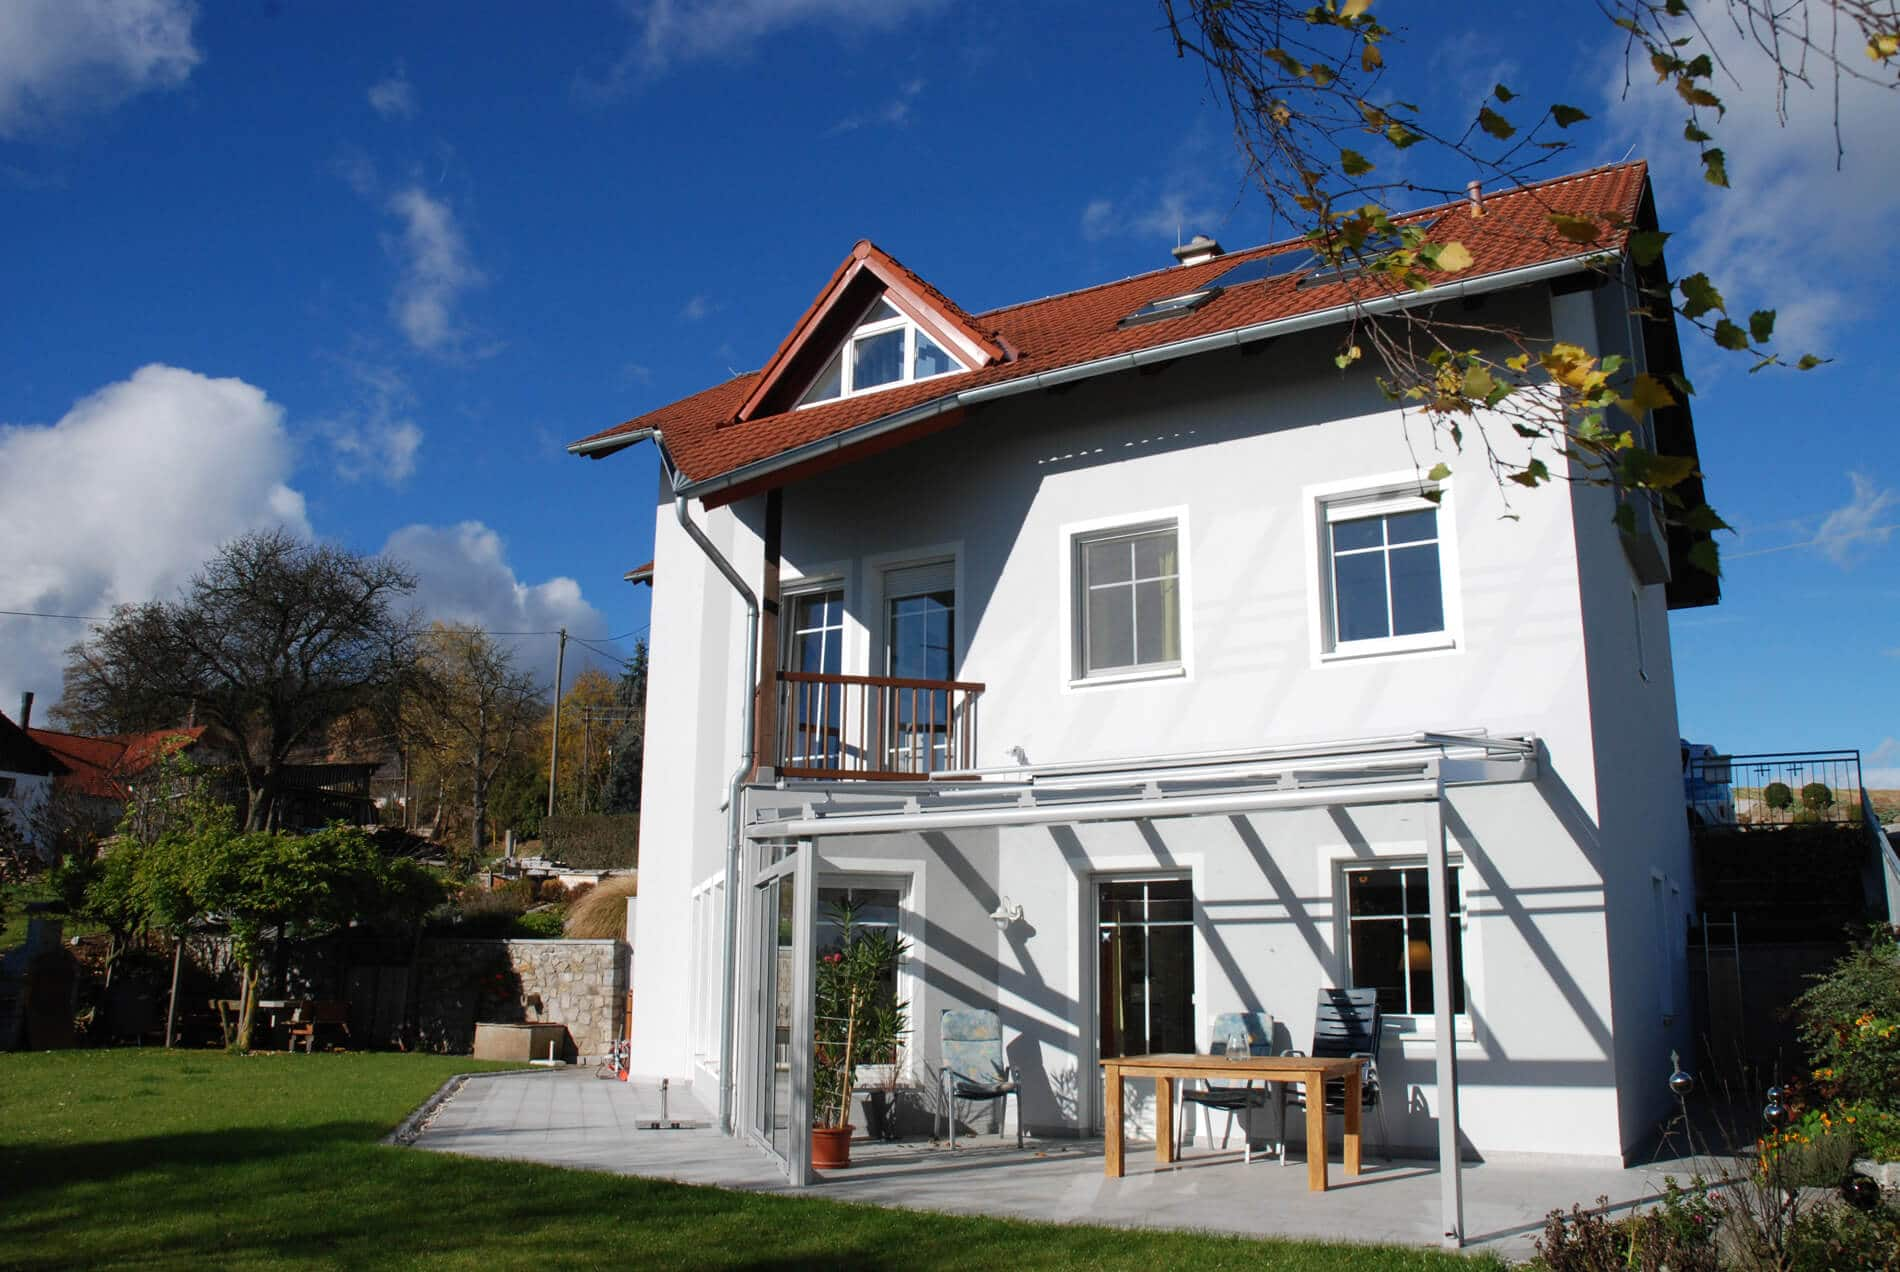 Terrassenuberdachung Pergola Mit Glasdach Wintergarten Schmidinger